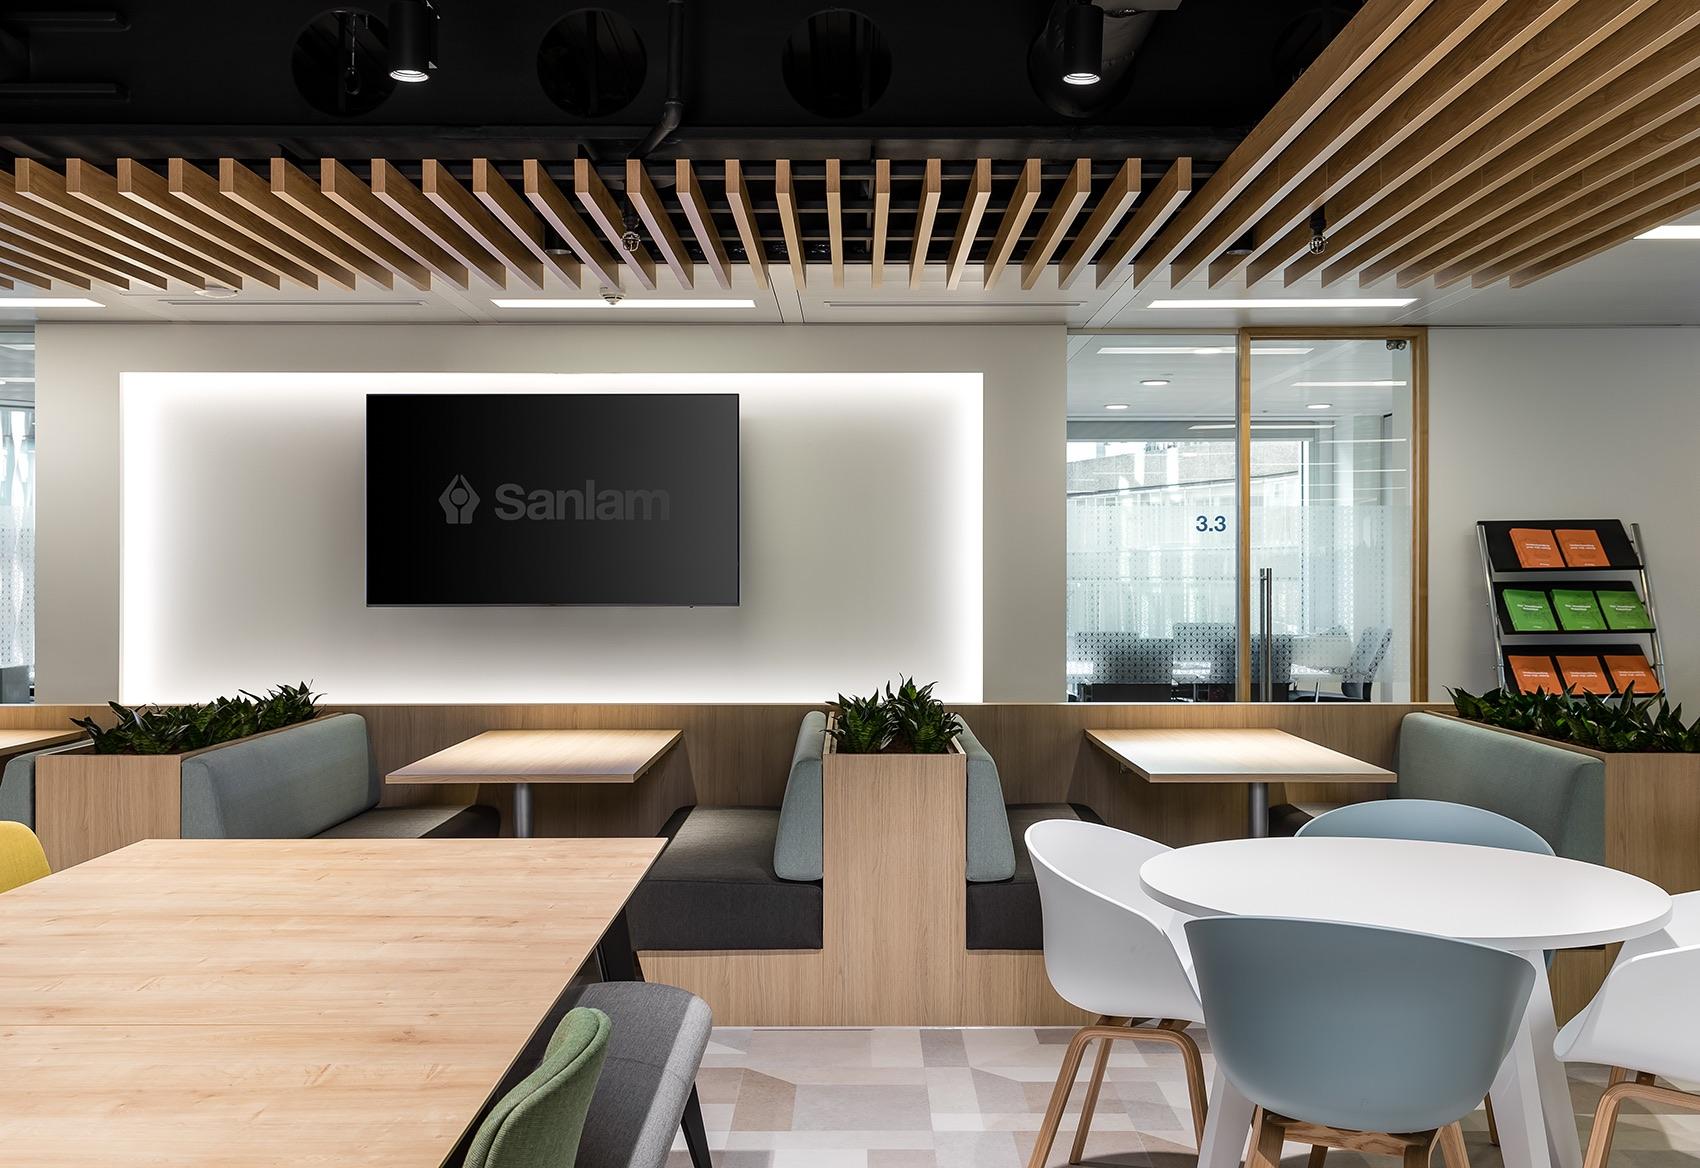 sanlam-london-office-18